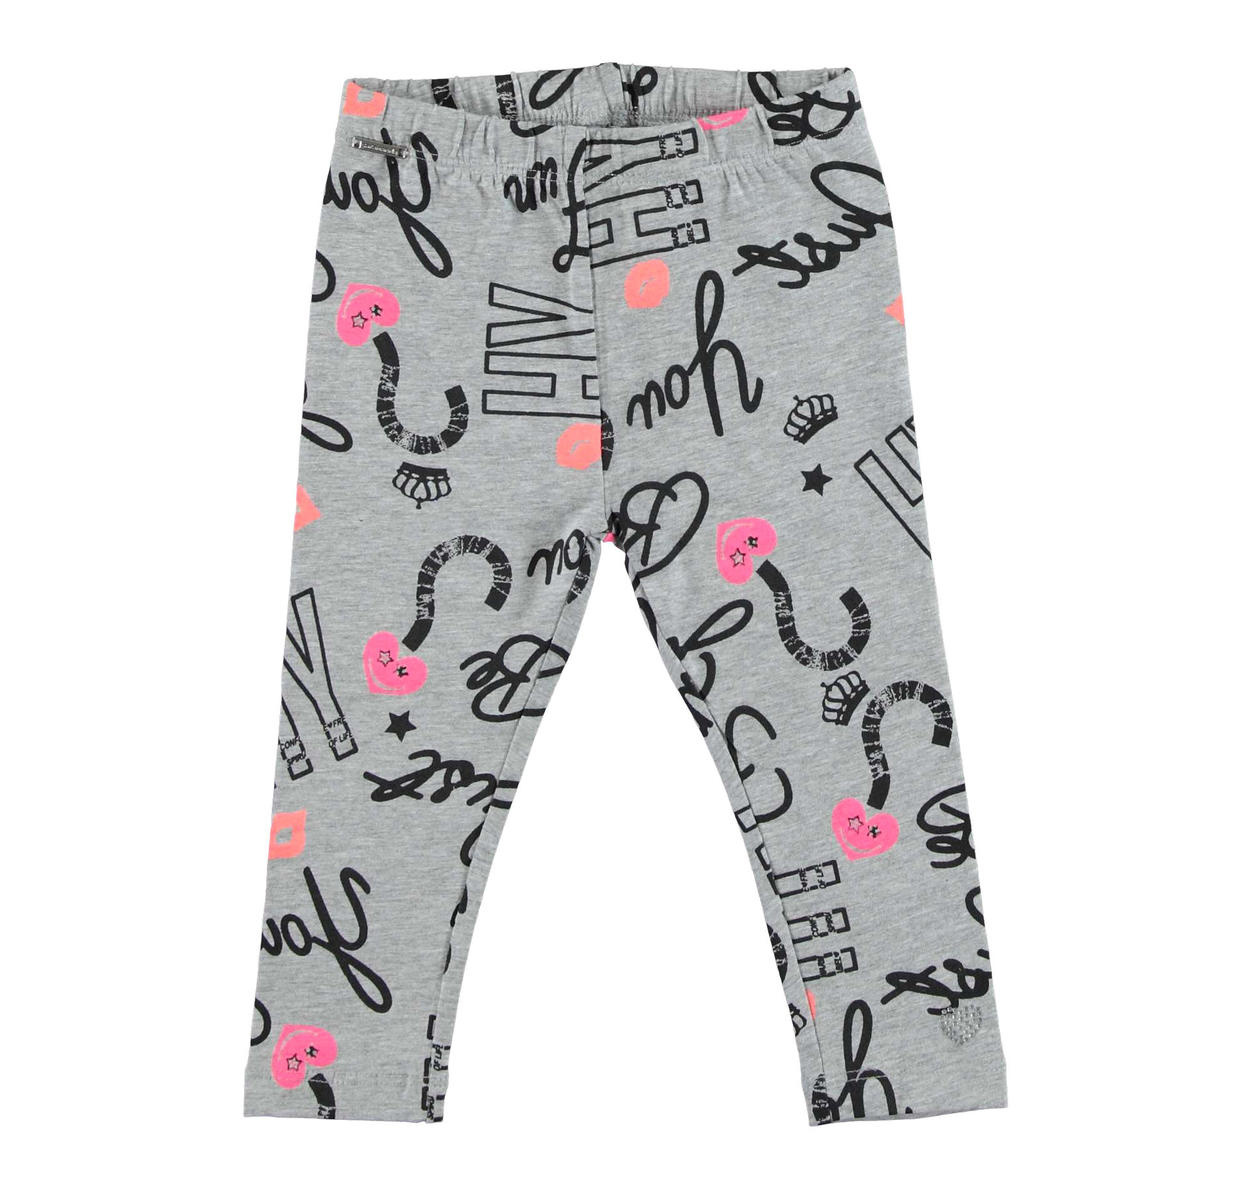 Girls Patterned Leggings Awesome Design